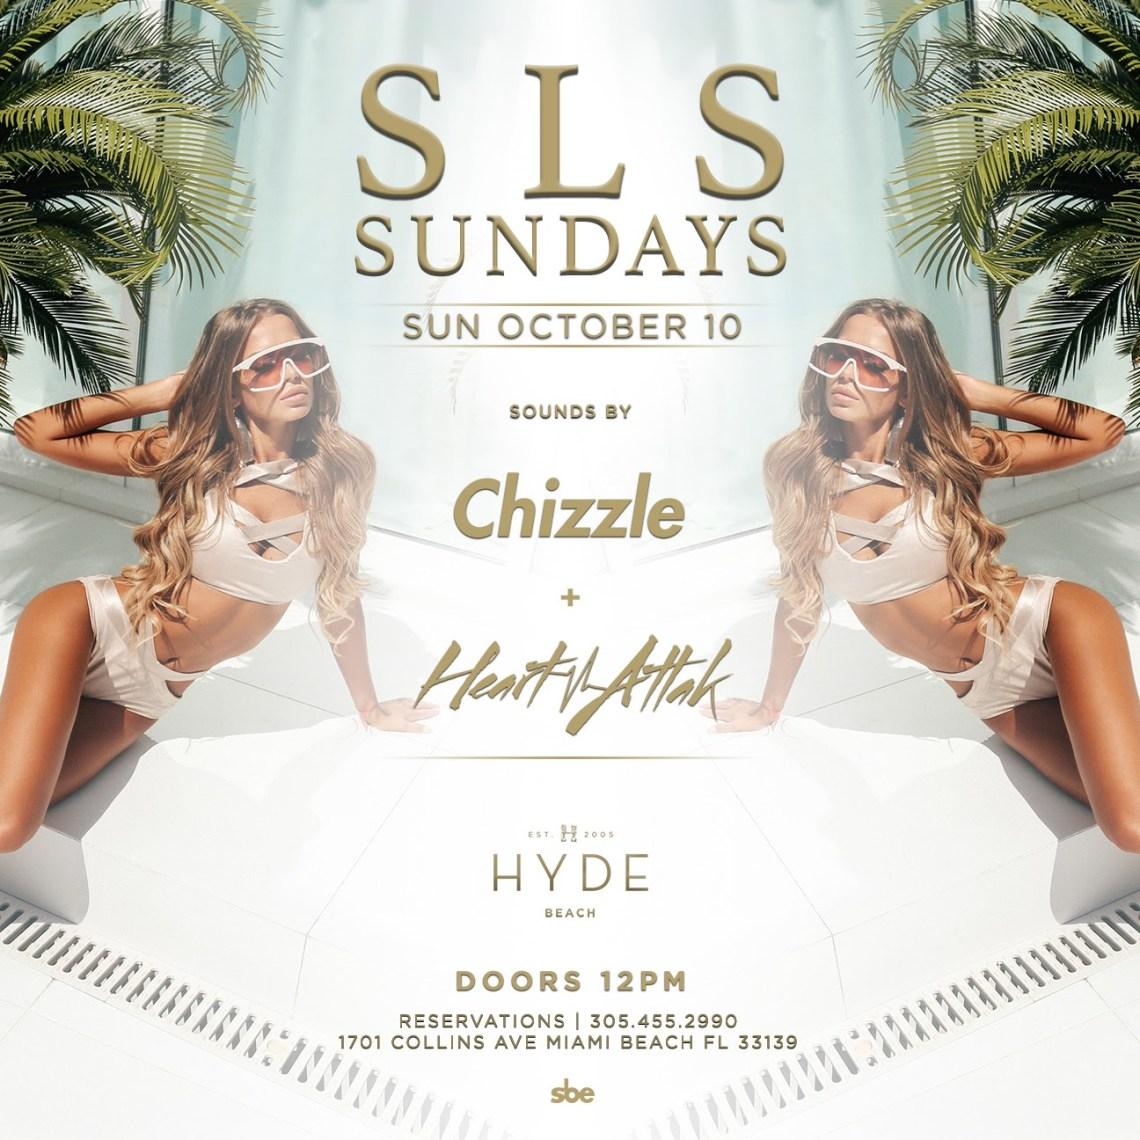 SLS Sundays at SLS South Beach Hyde Beach - Chizzle AND Heart Attak